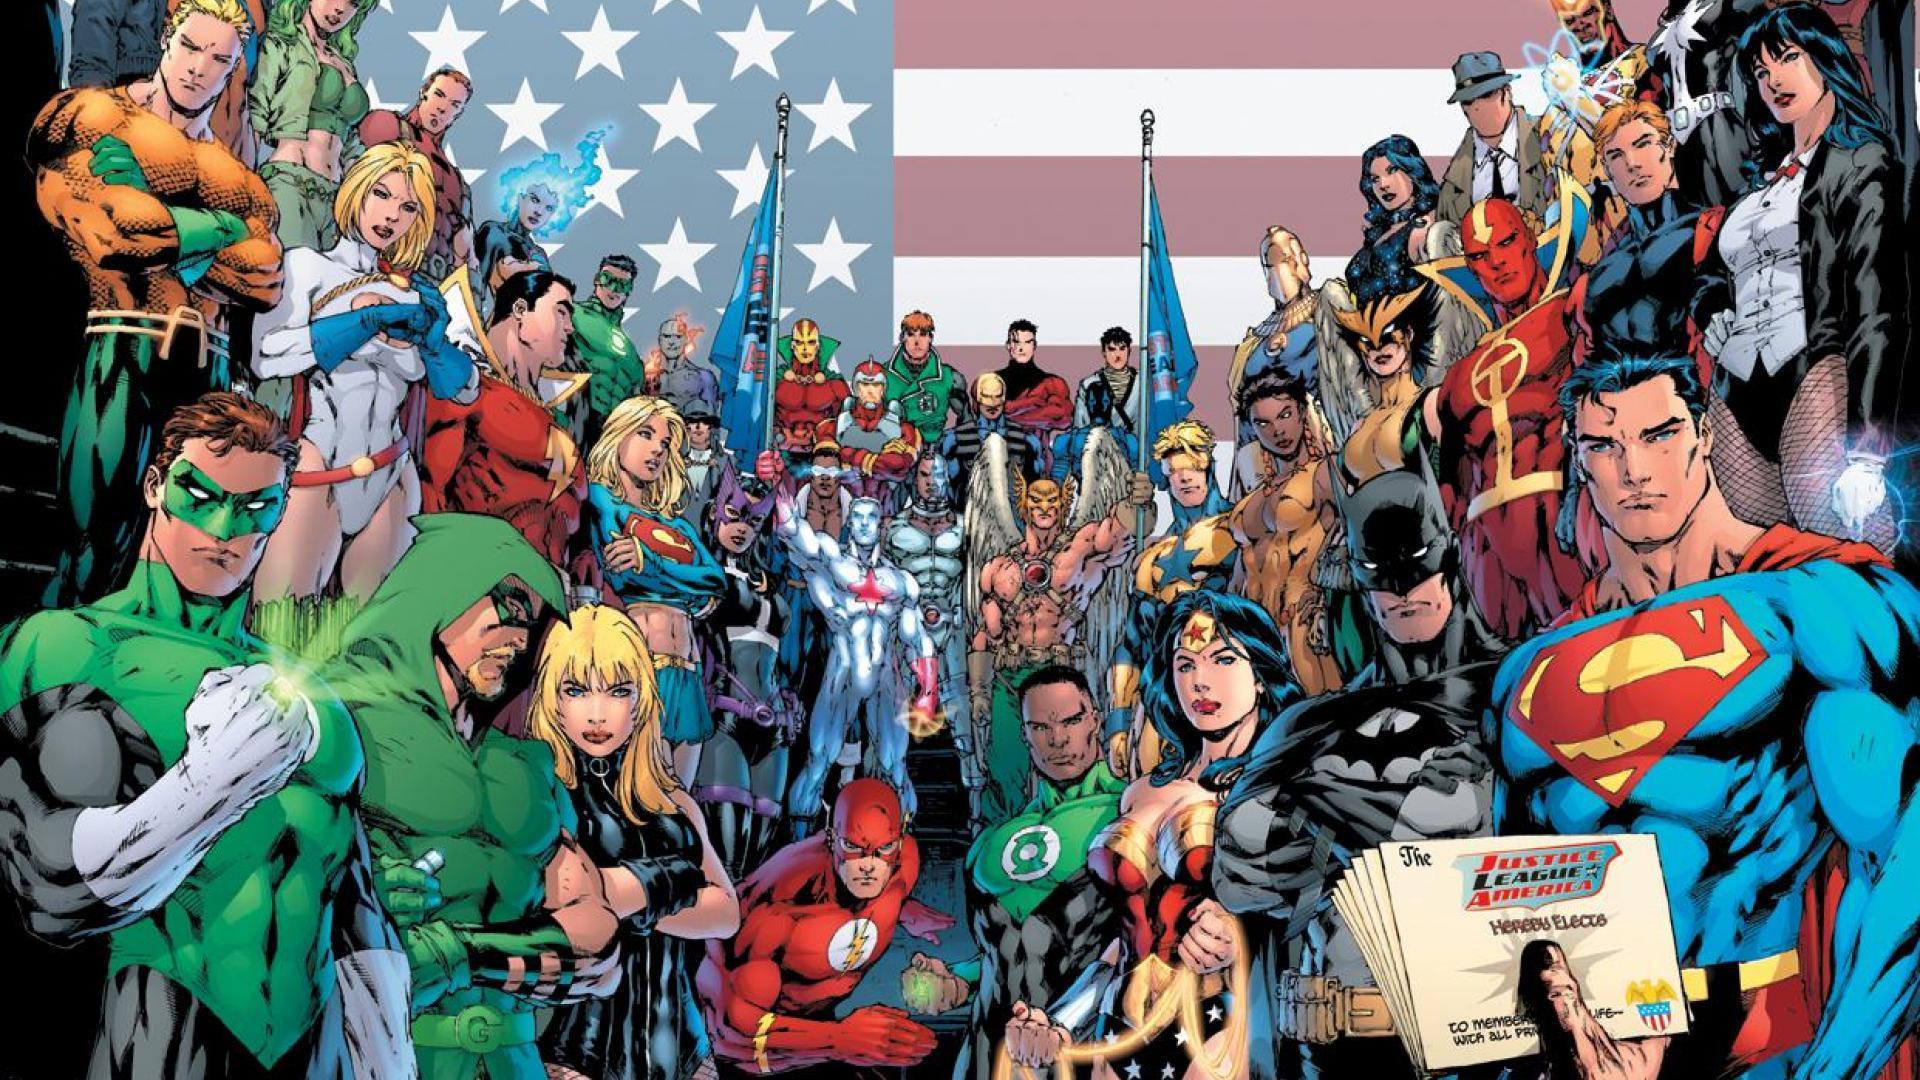 DC Heroes HD Wallpapers - Wallpaper Cave